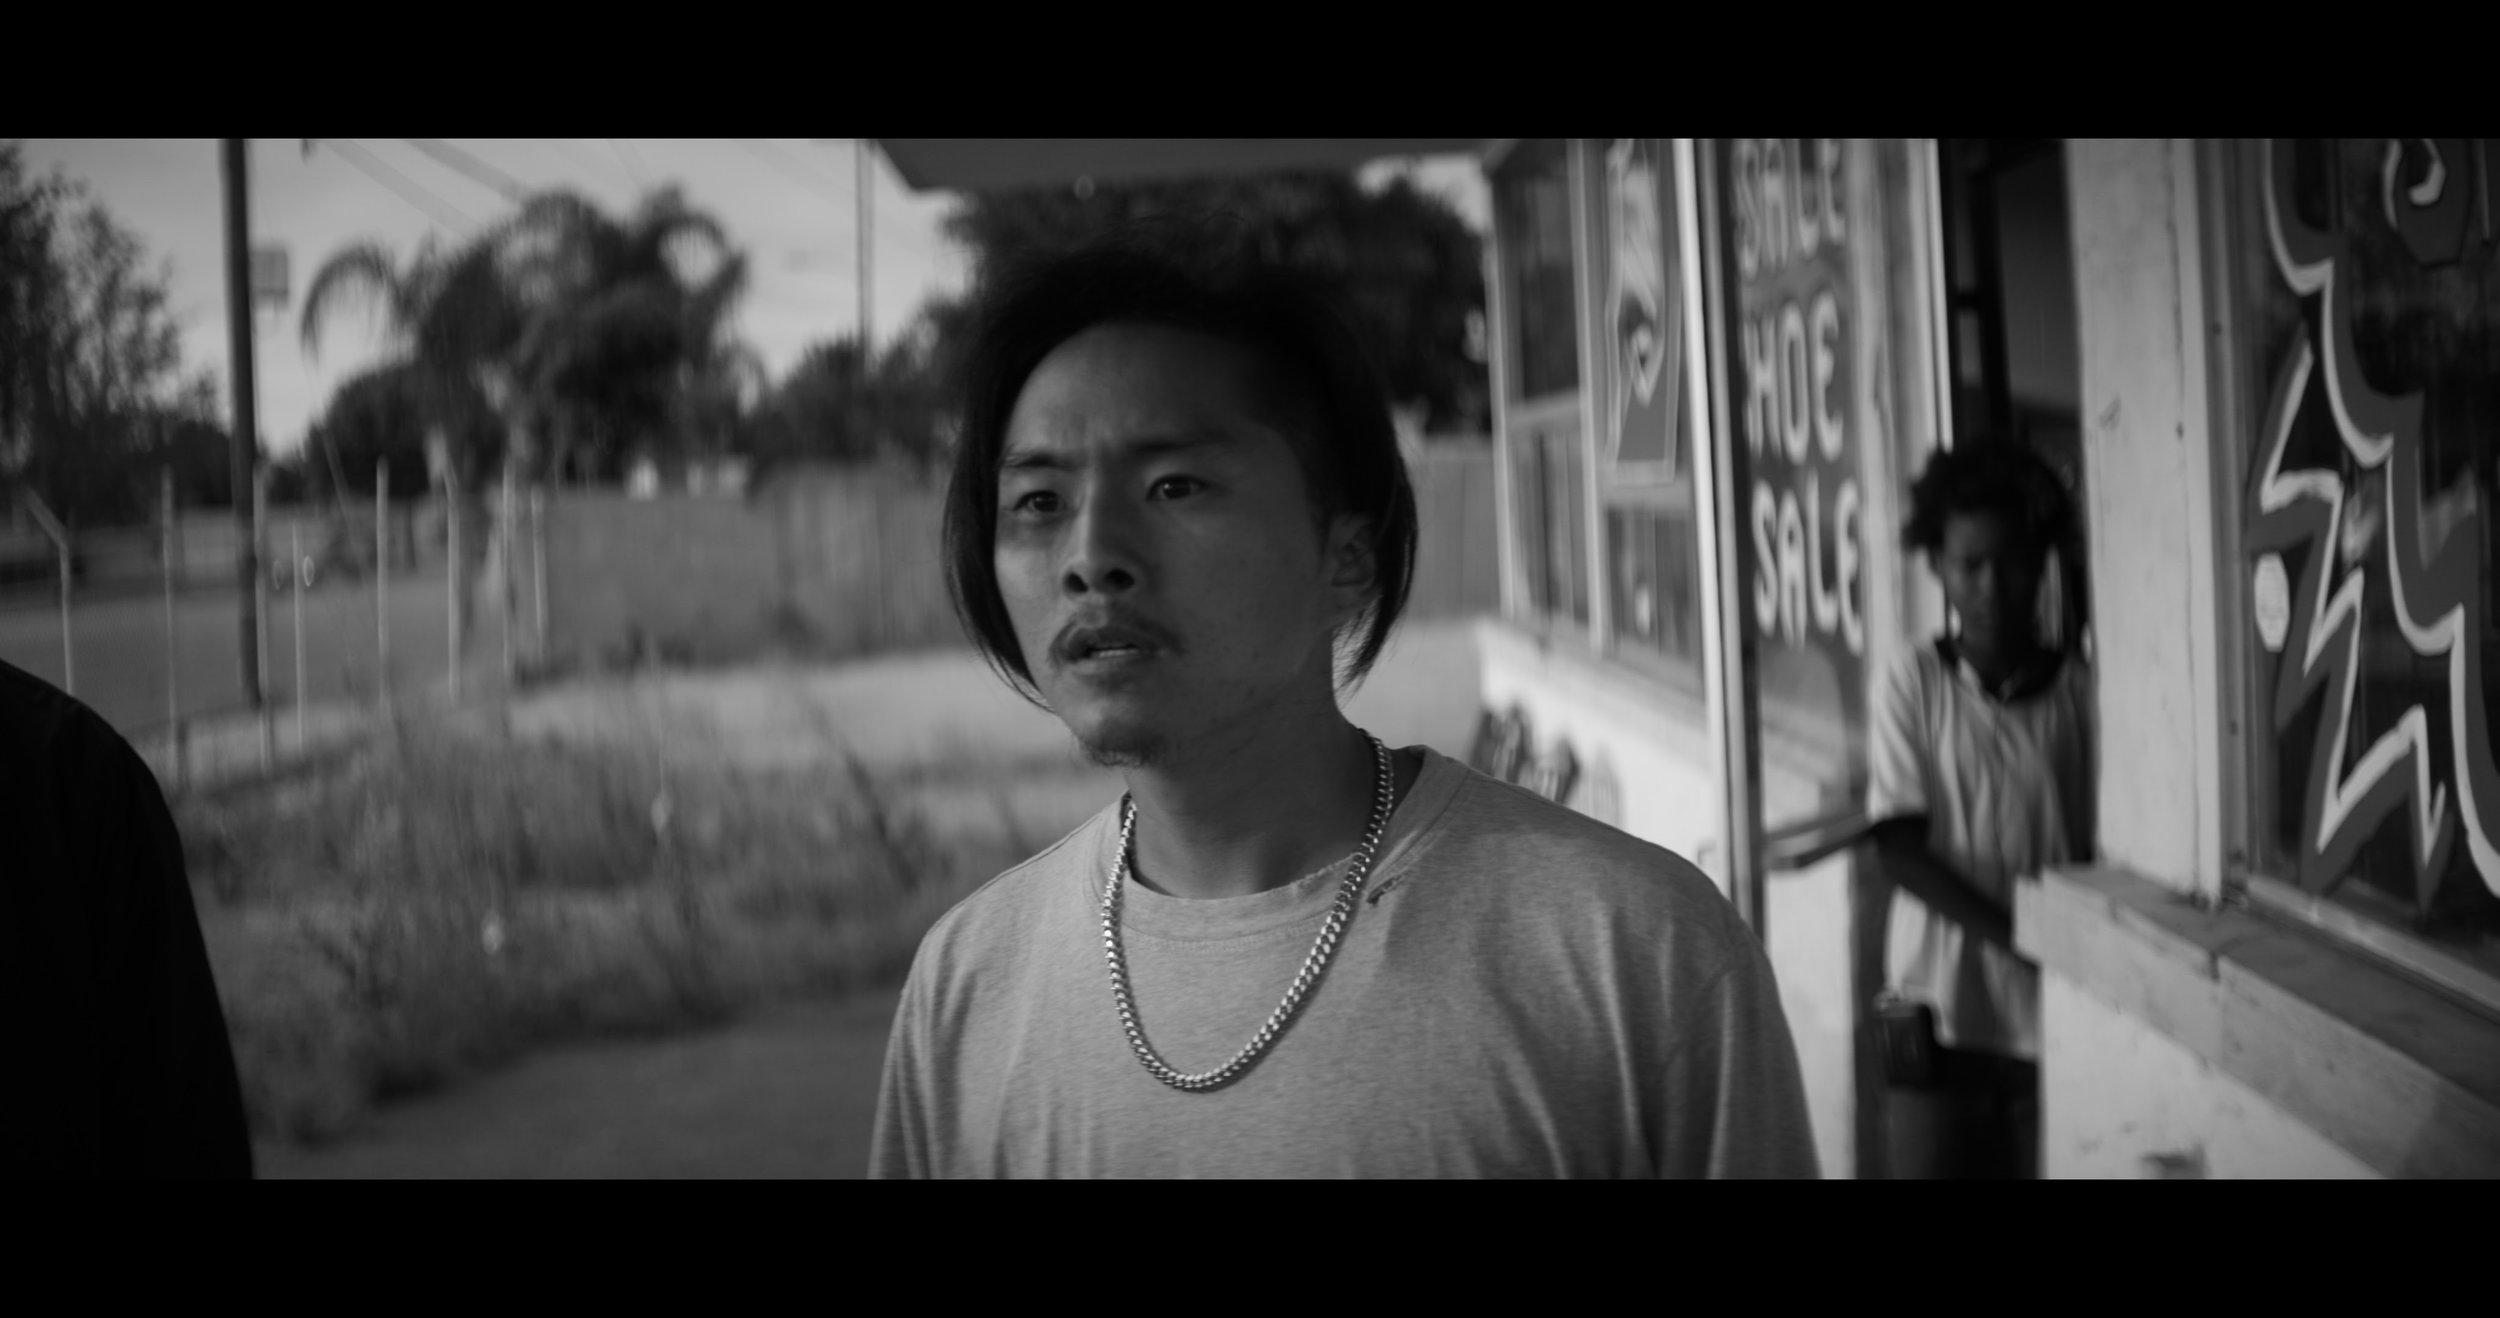 Gook-Justin Chon